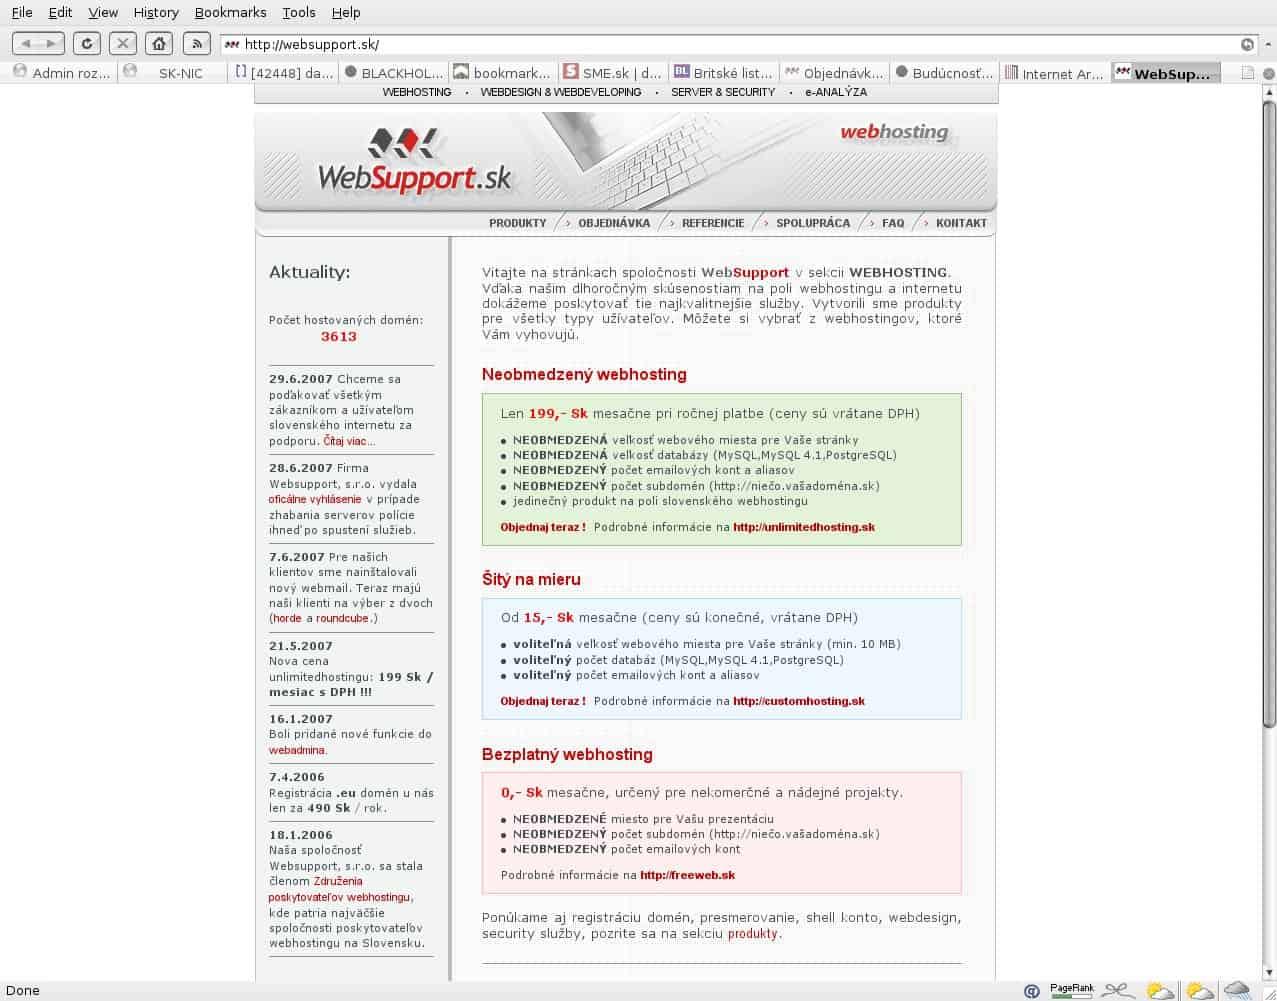 screenshot-2006-2007